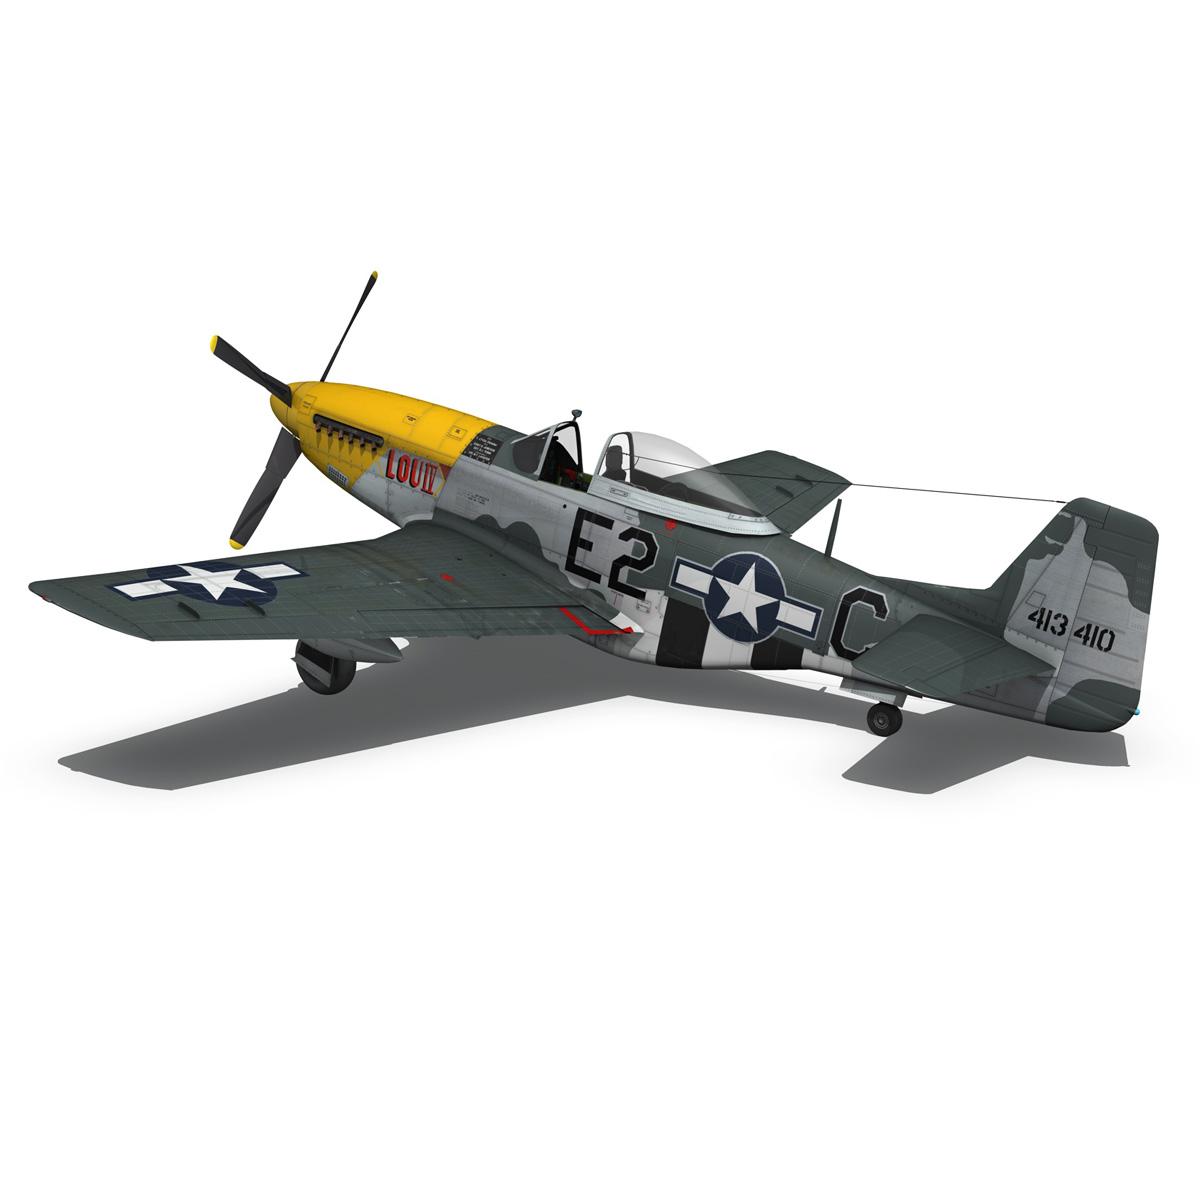 north american p-51d mustang – lou iv 3d model fbx c4d lwo obj 272609